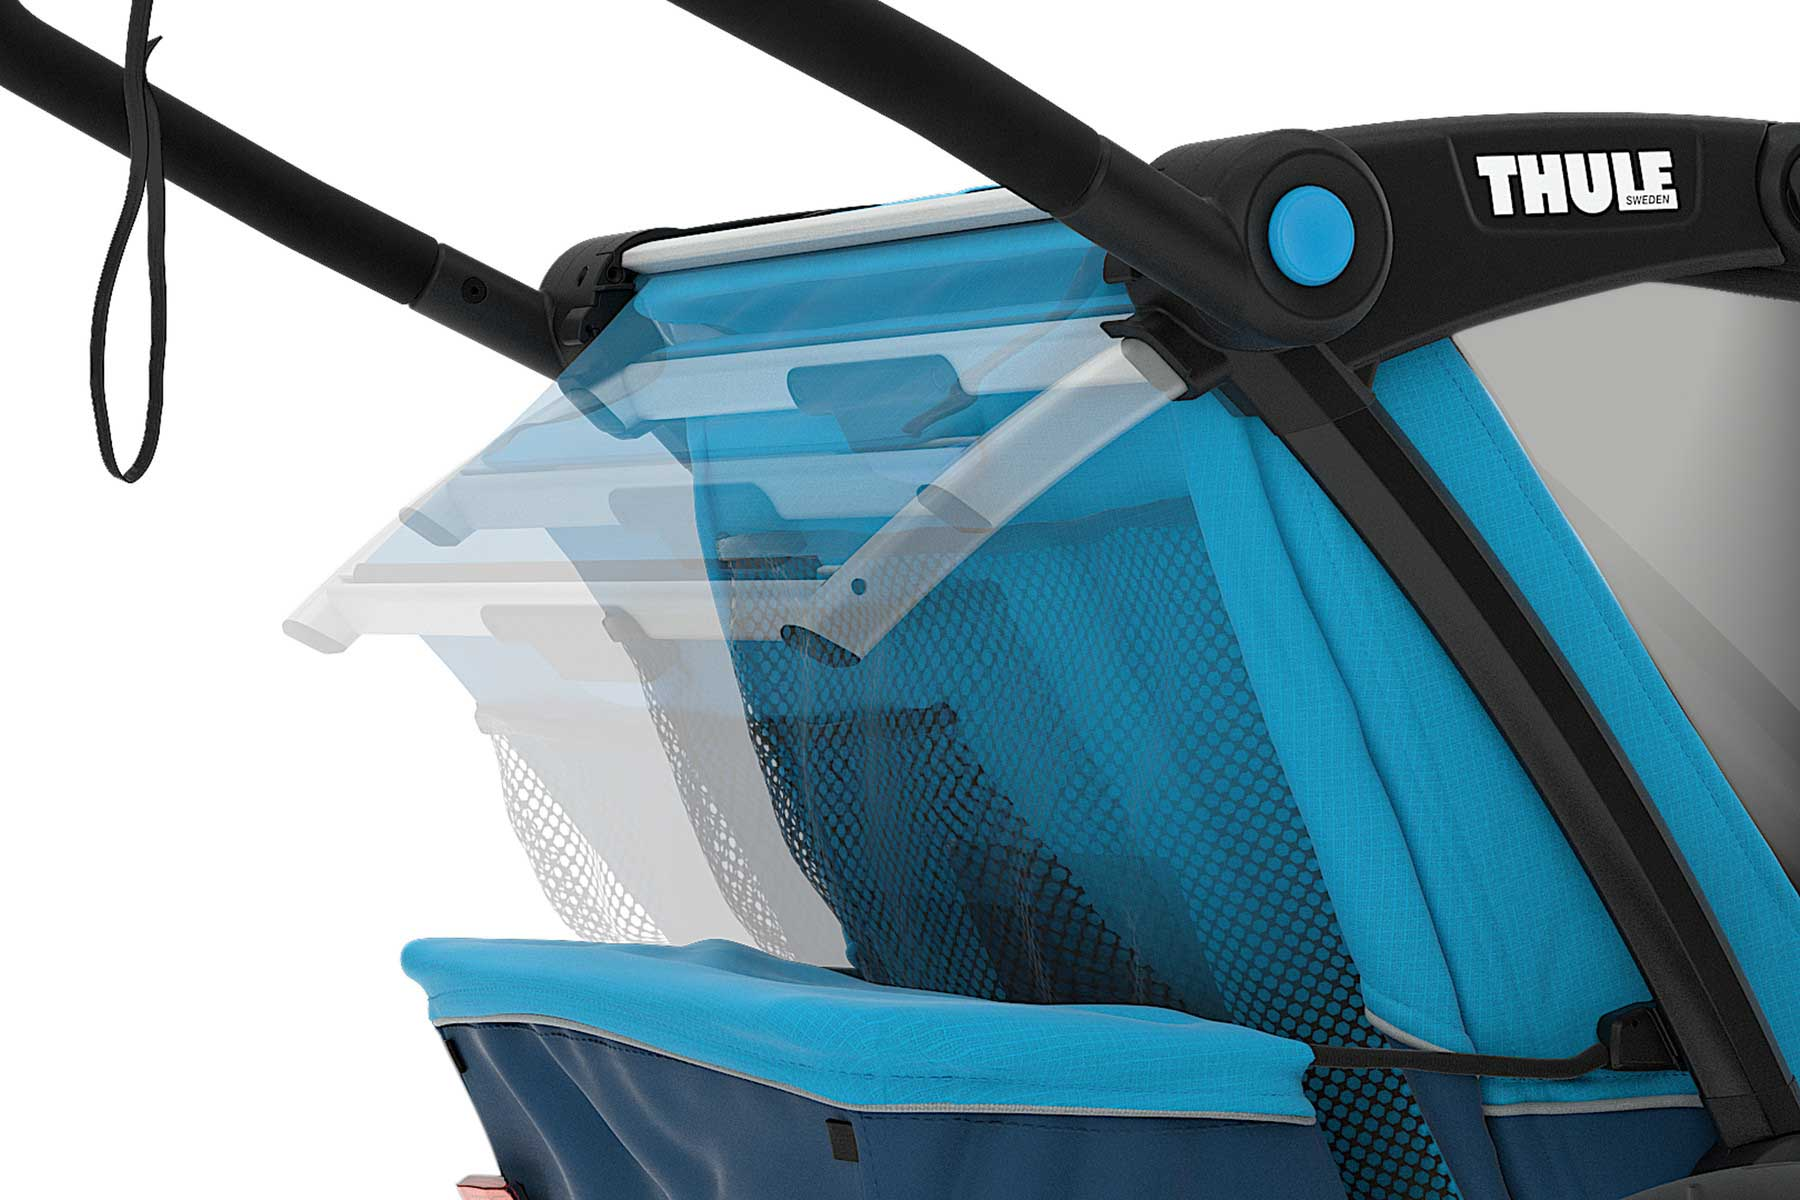 MULTIFUNCIONAL BIKE TRAILER CHARIOT CROSS 1 BLUE POS -THULE